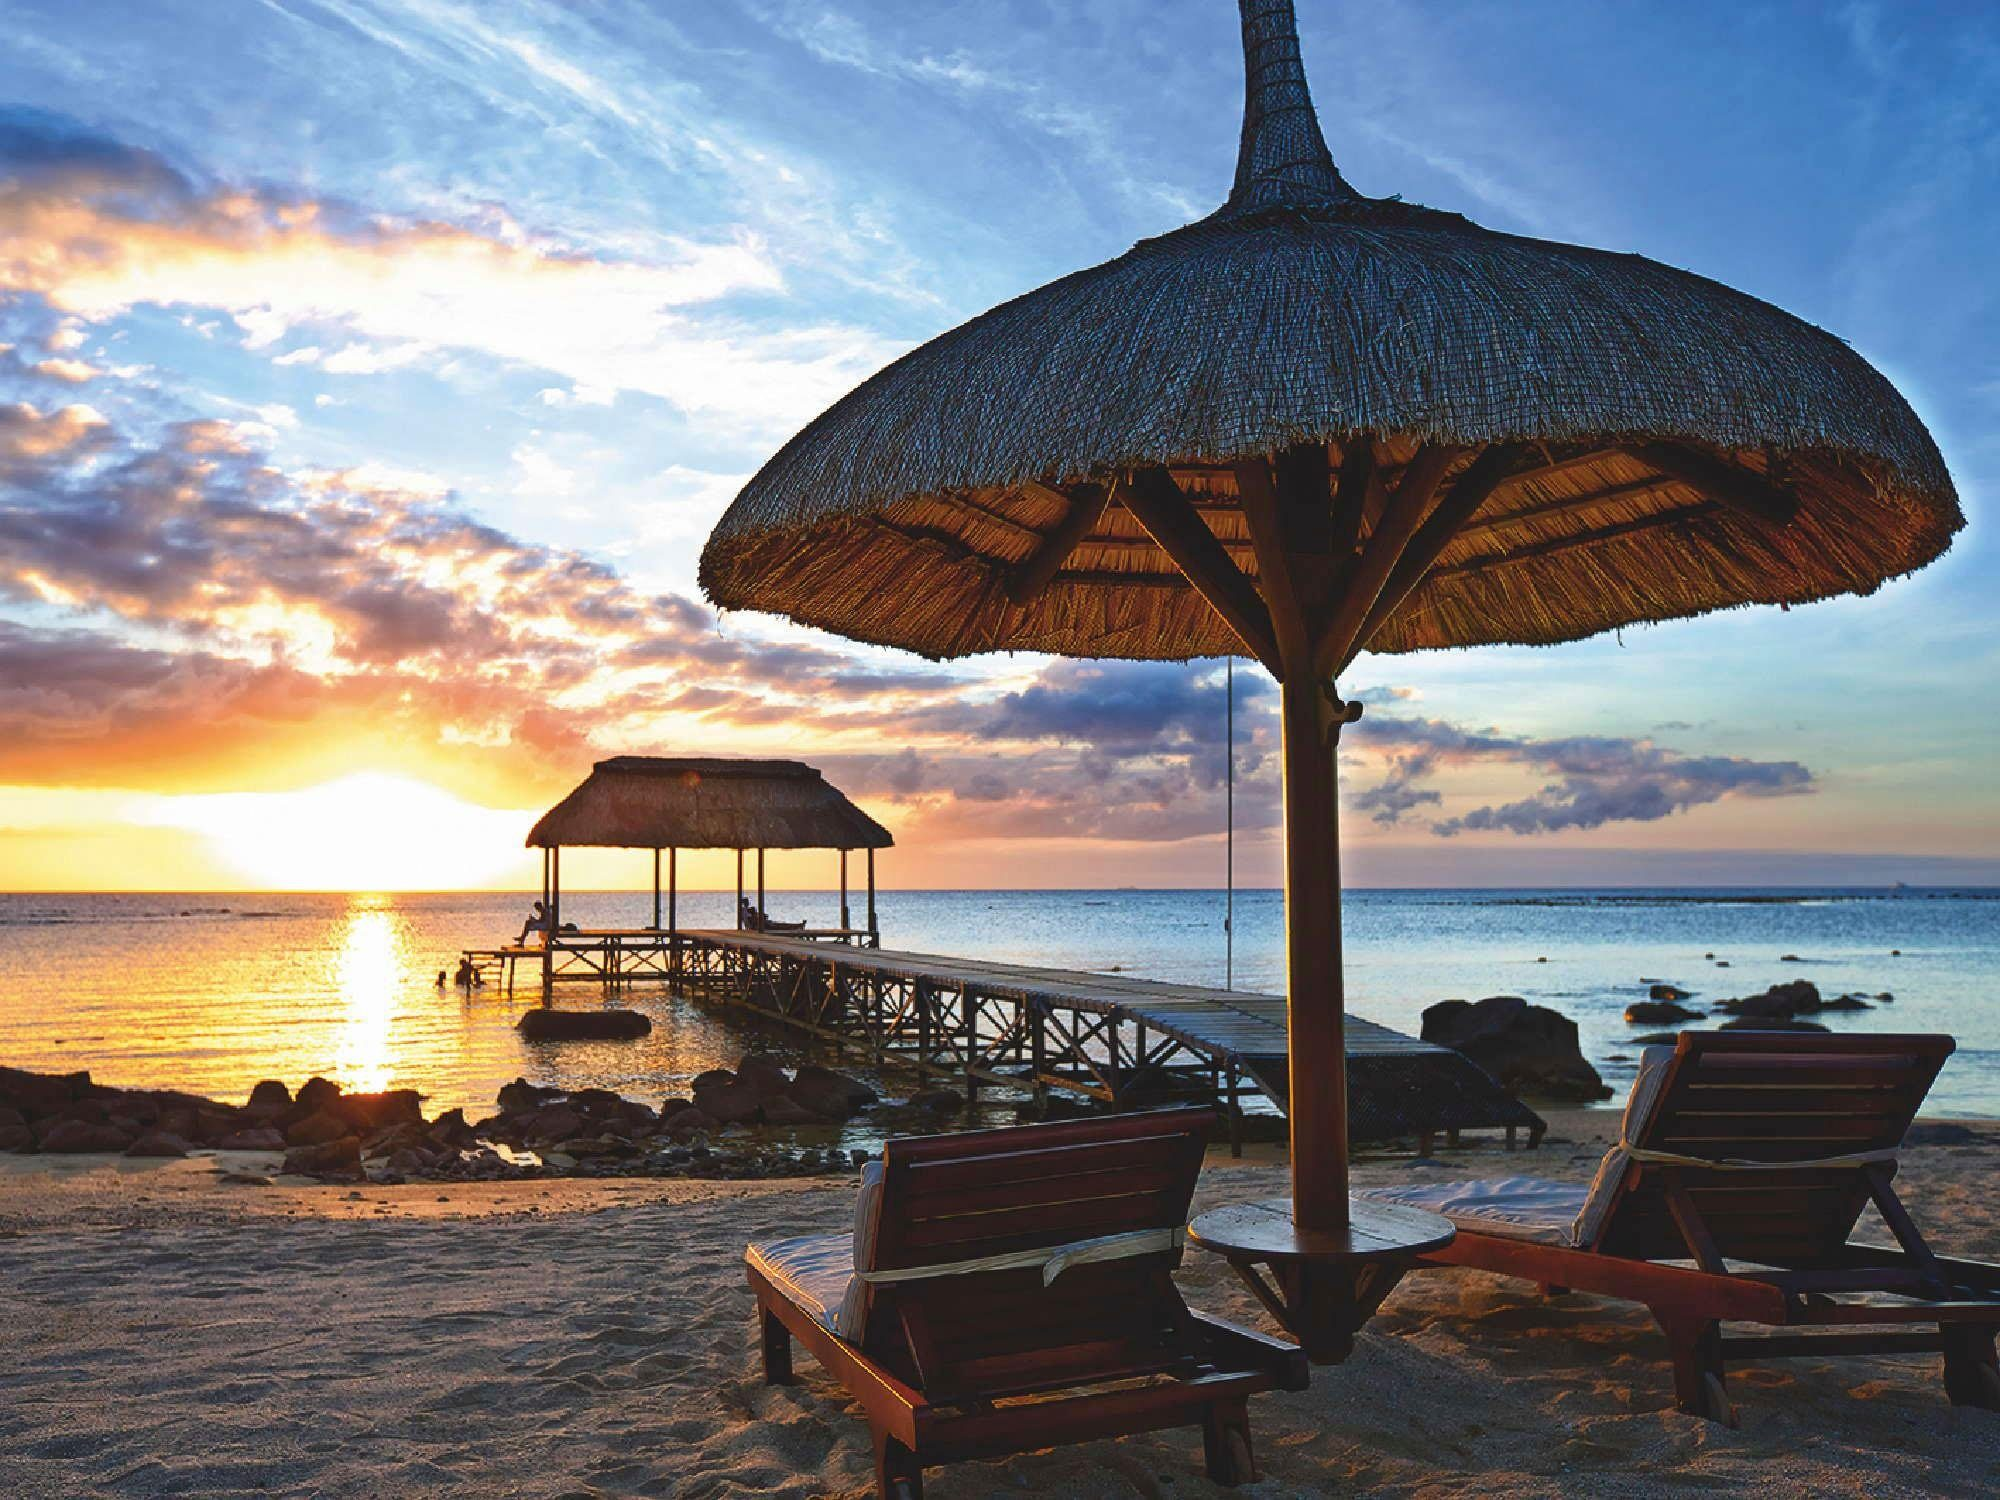 Home affaire Glasbild »Sonnenuntergang auf Mauritius Island«, Strand, Meer, 80/60 cm